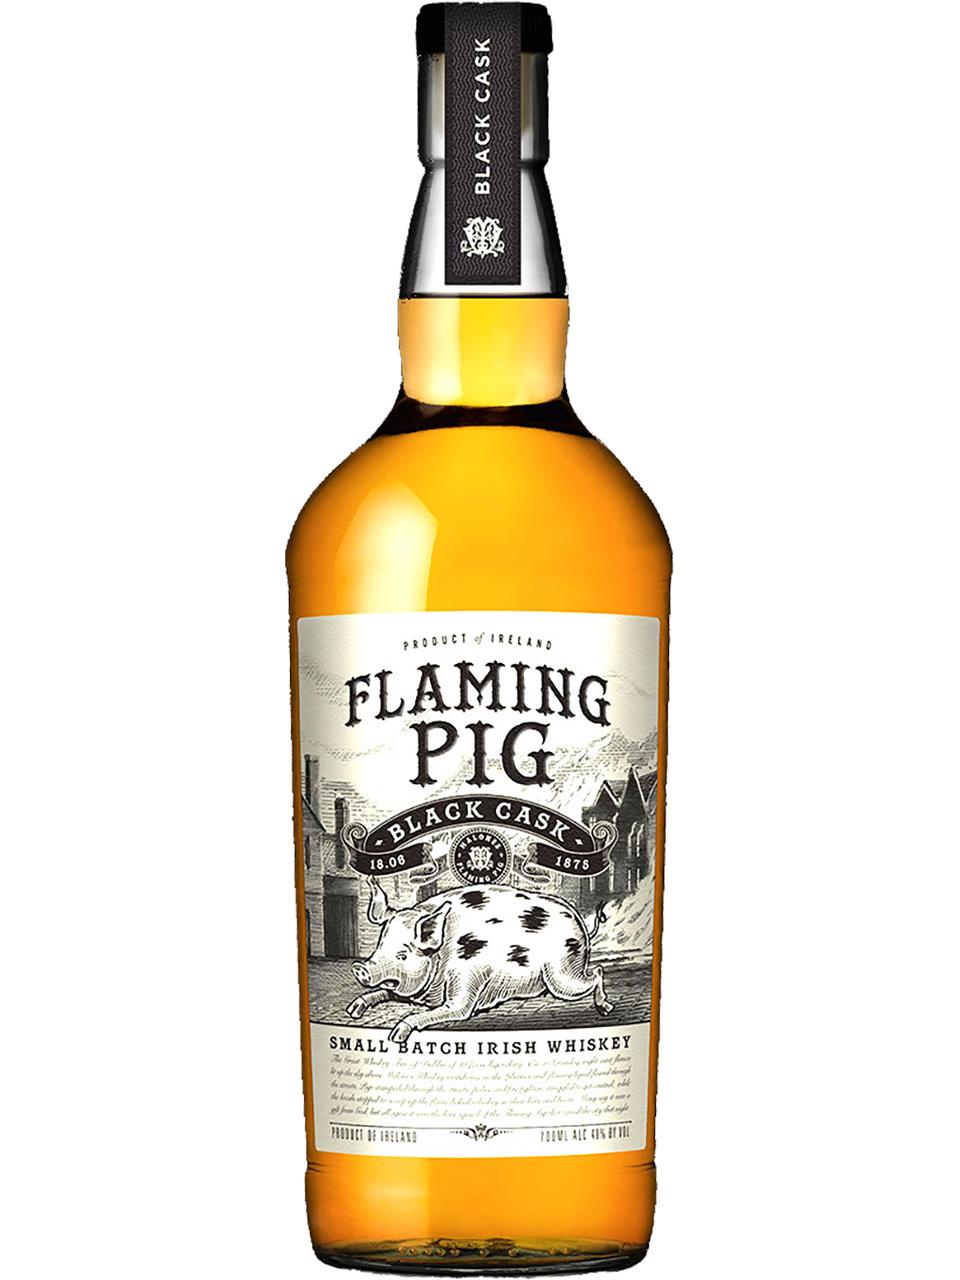 Flaming Pig Black Cask Small Batch Irish Whiskey